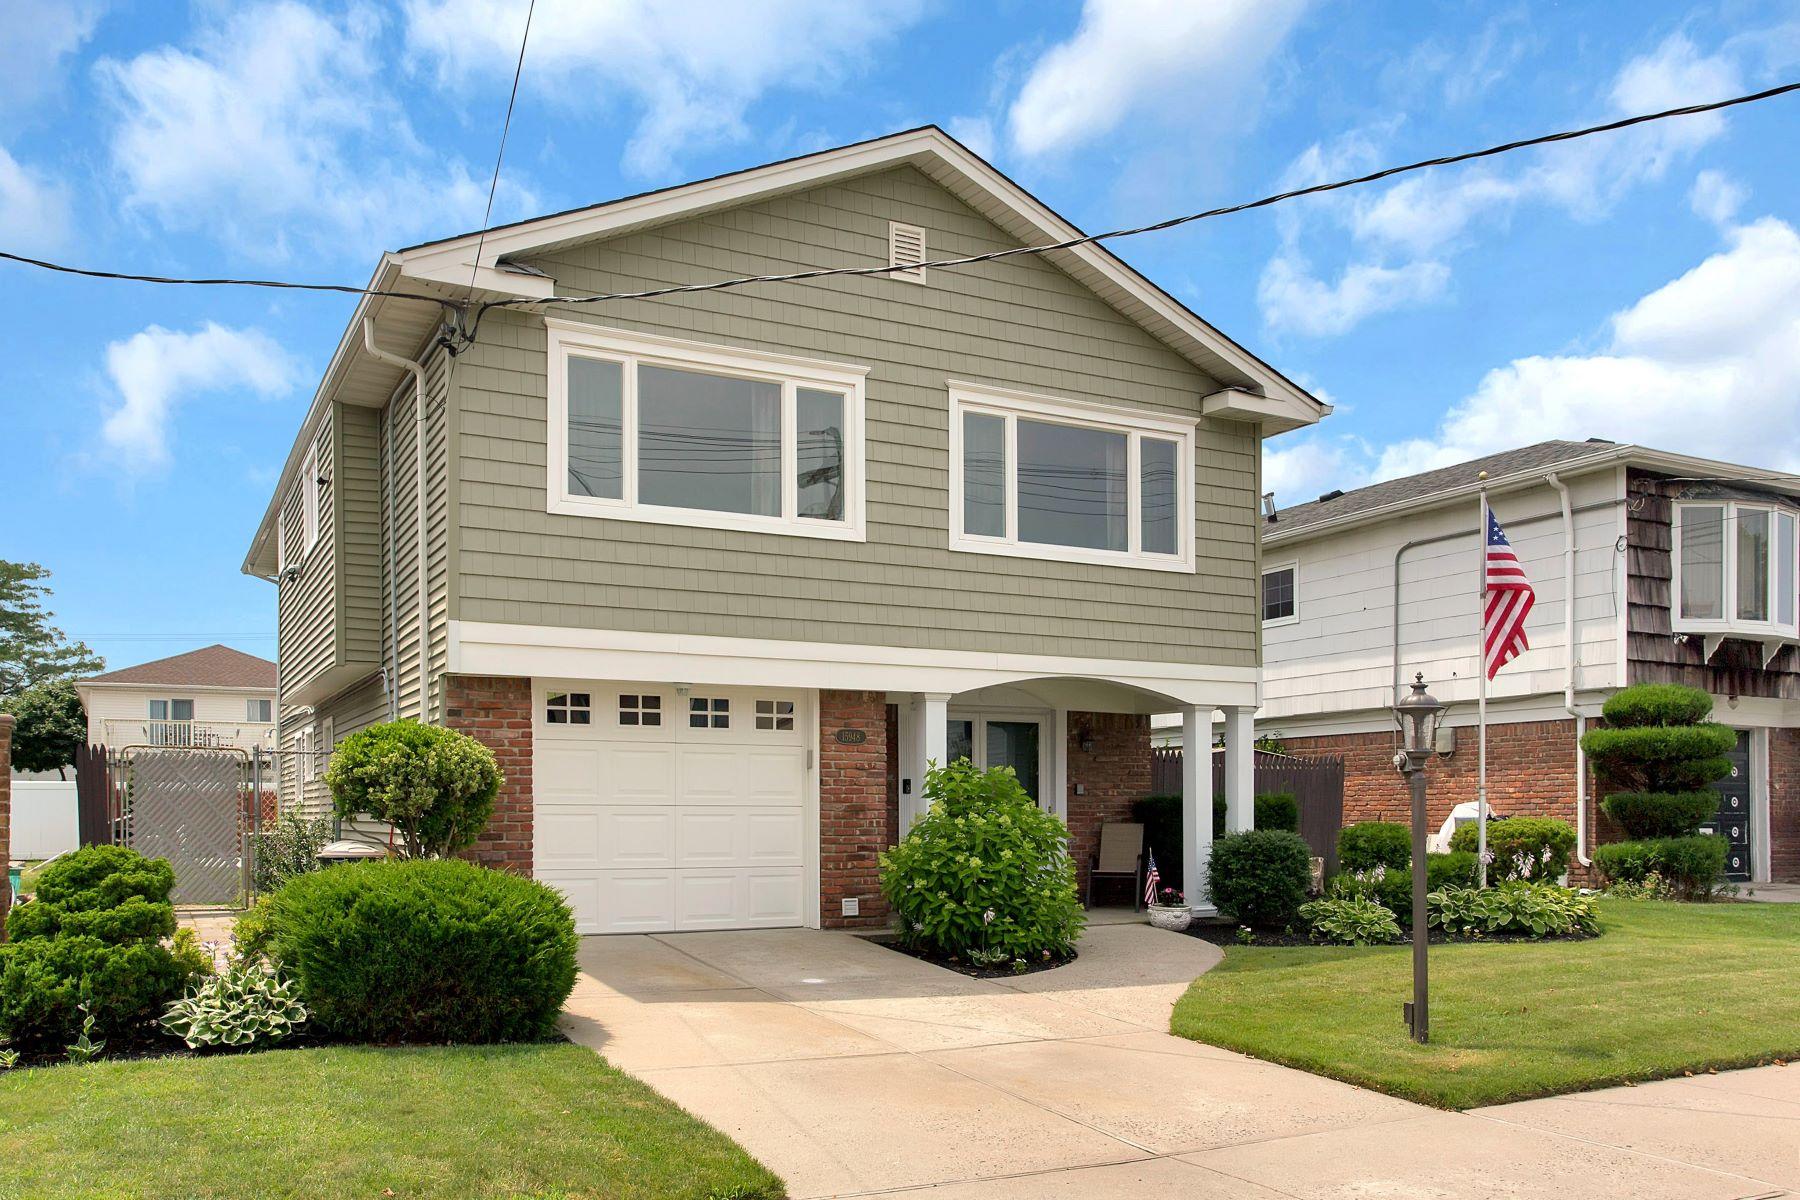 Single Family Homes for Active at Howard Beach 159-48 82 St Howard Beach, New York 11414 United States